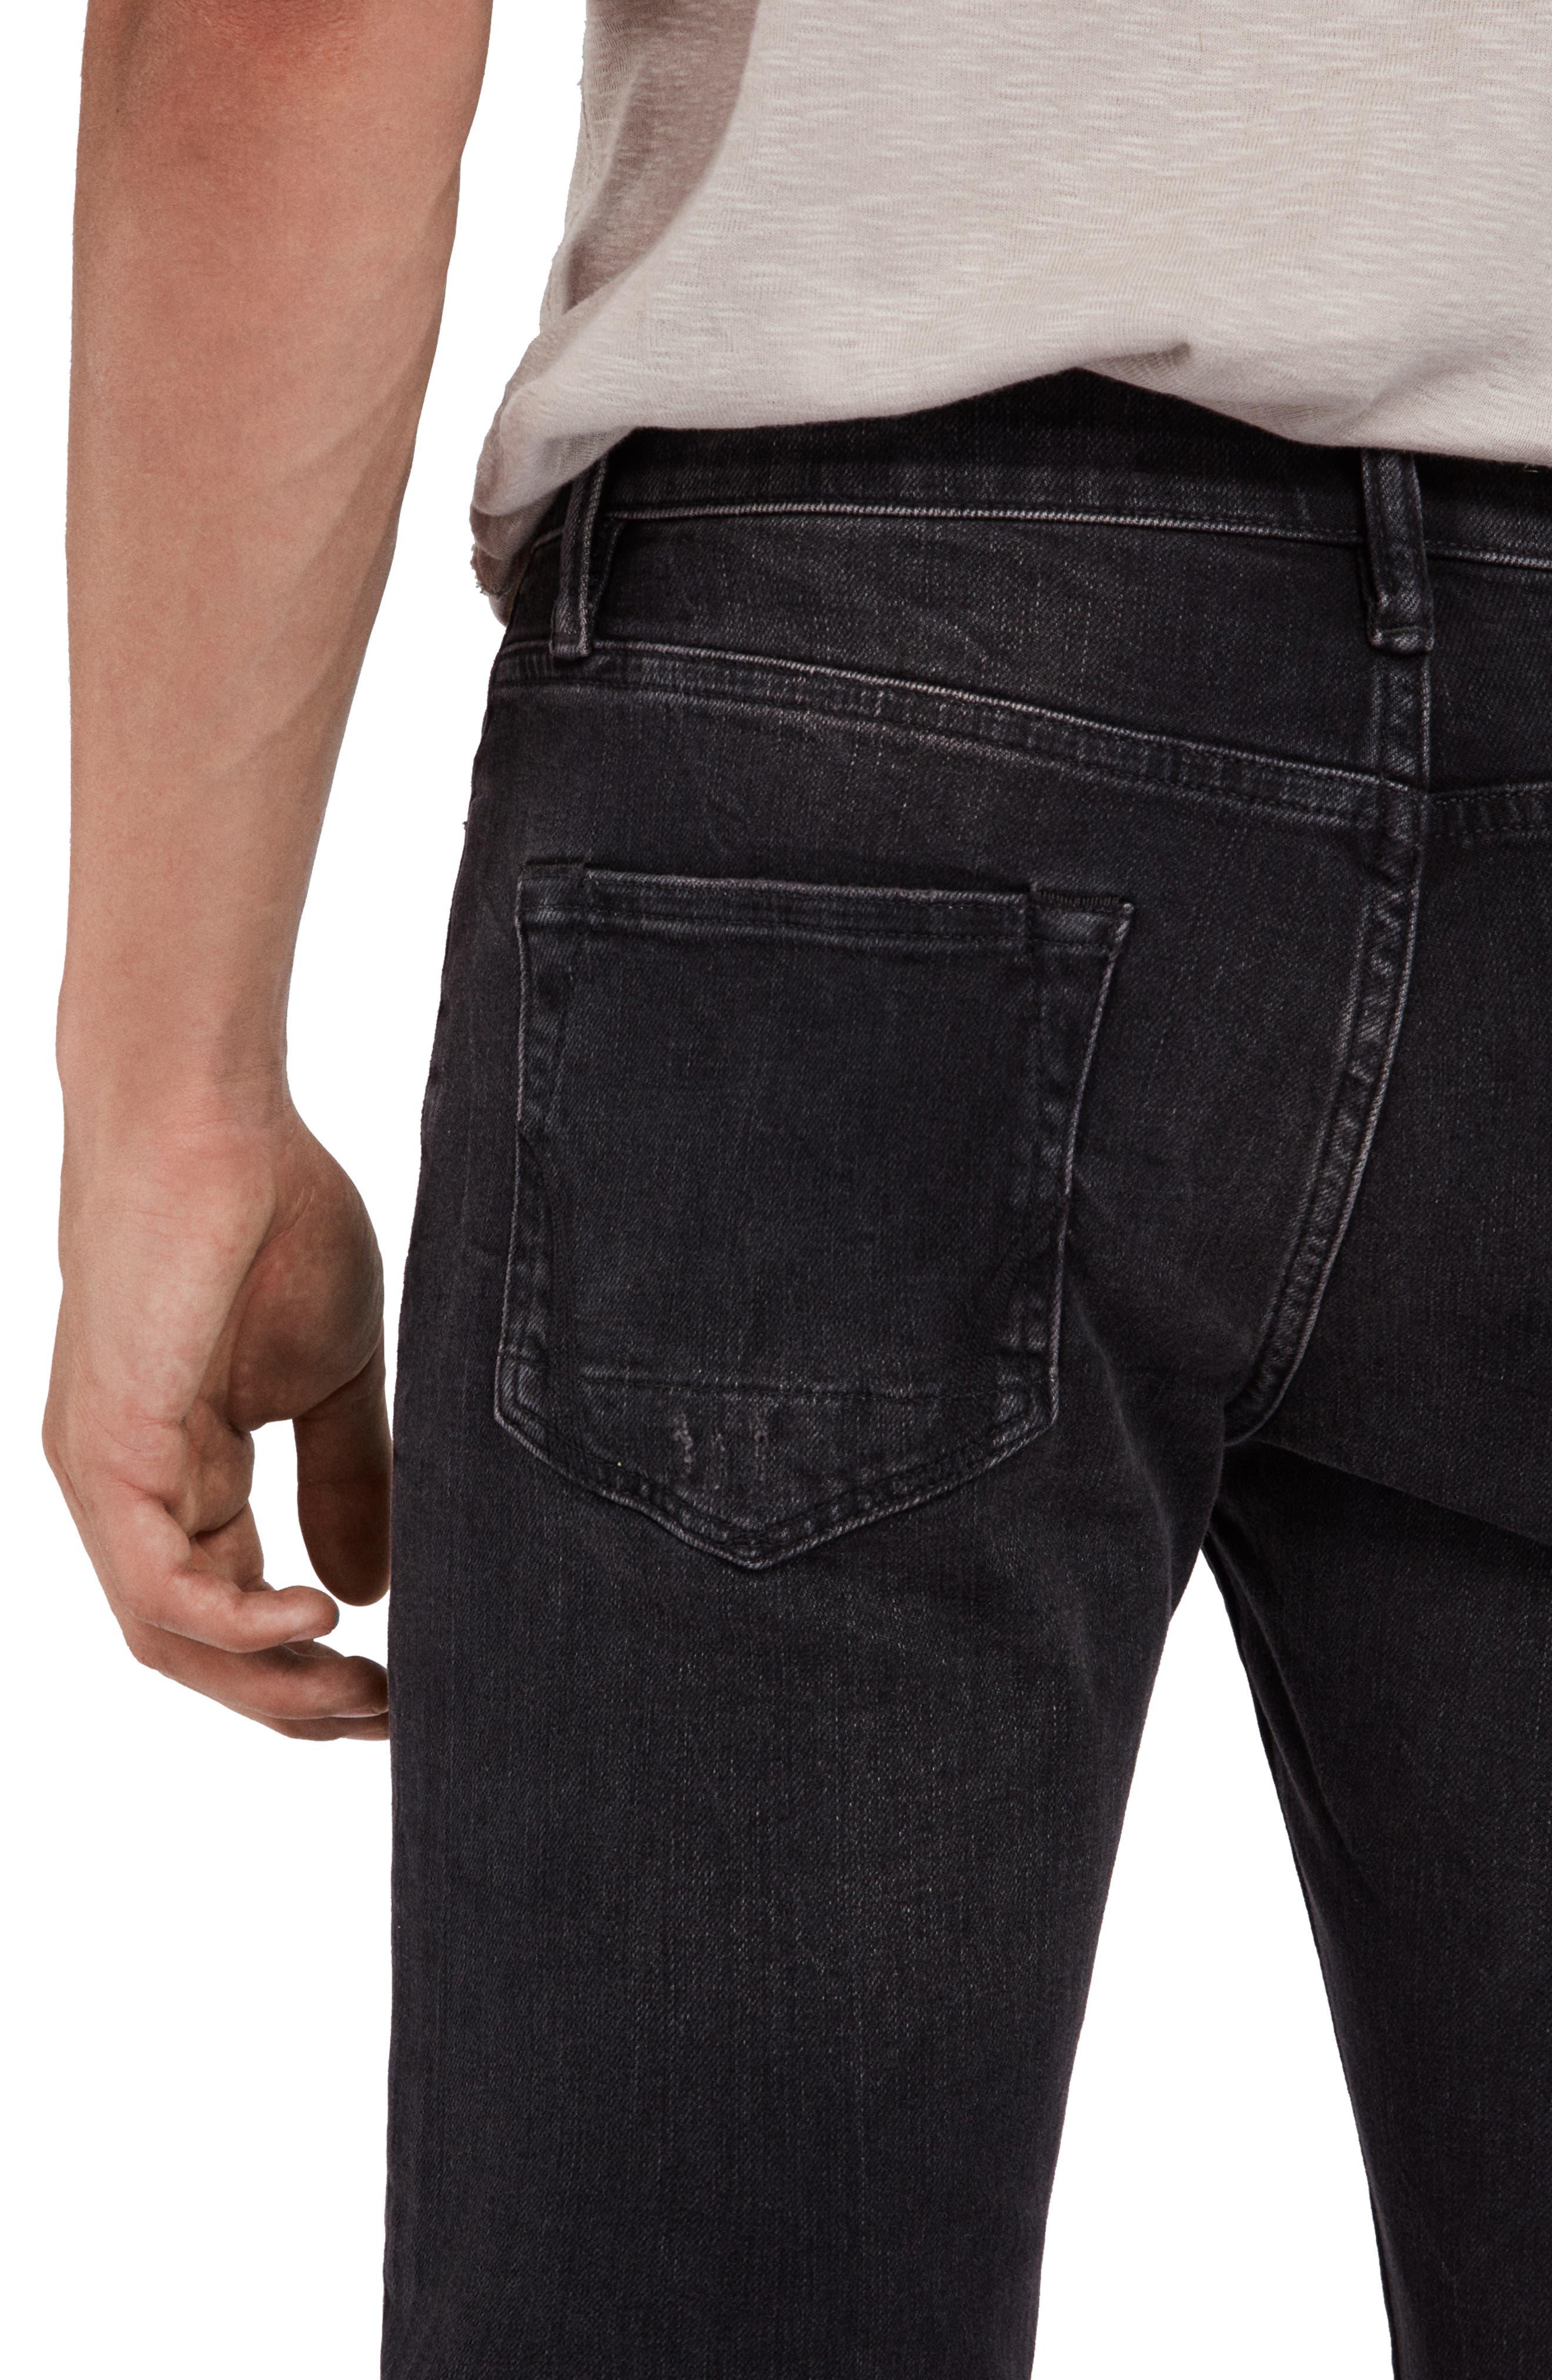 Rex Slim Fit Straight Leg Jeans,                             Alternate thumbnail 7, color,                             005